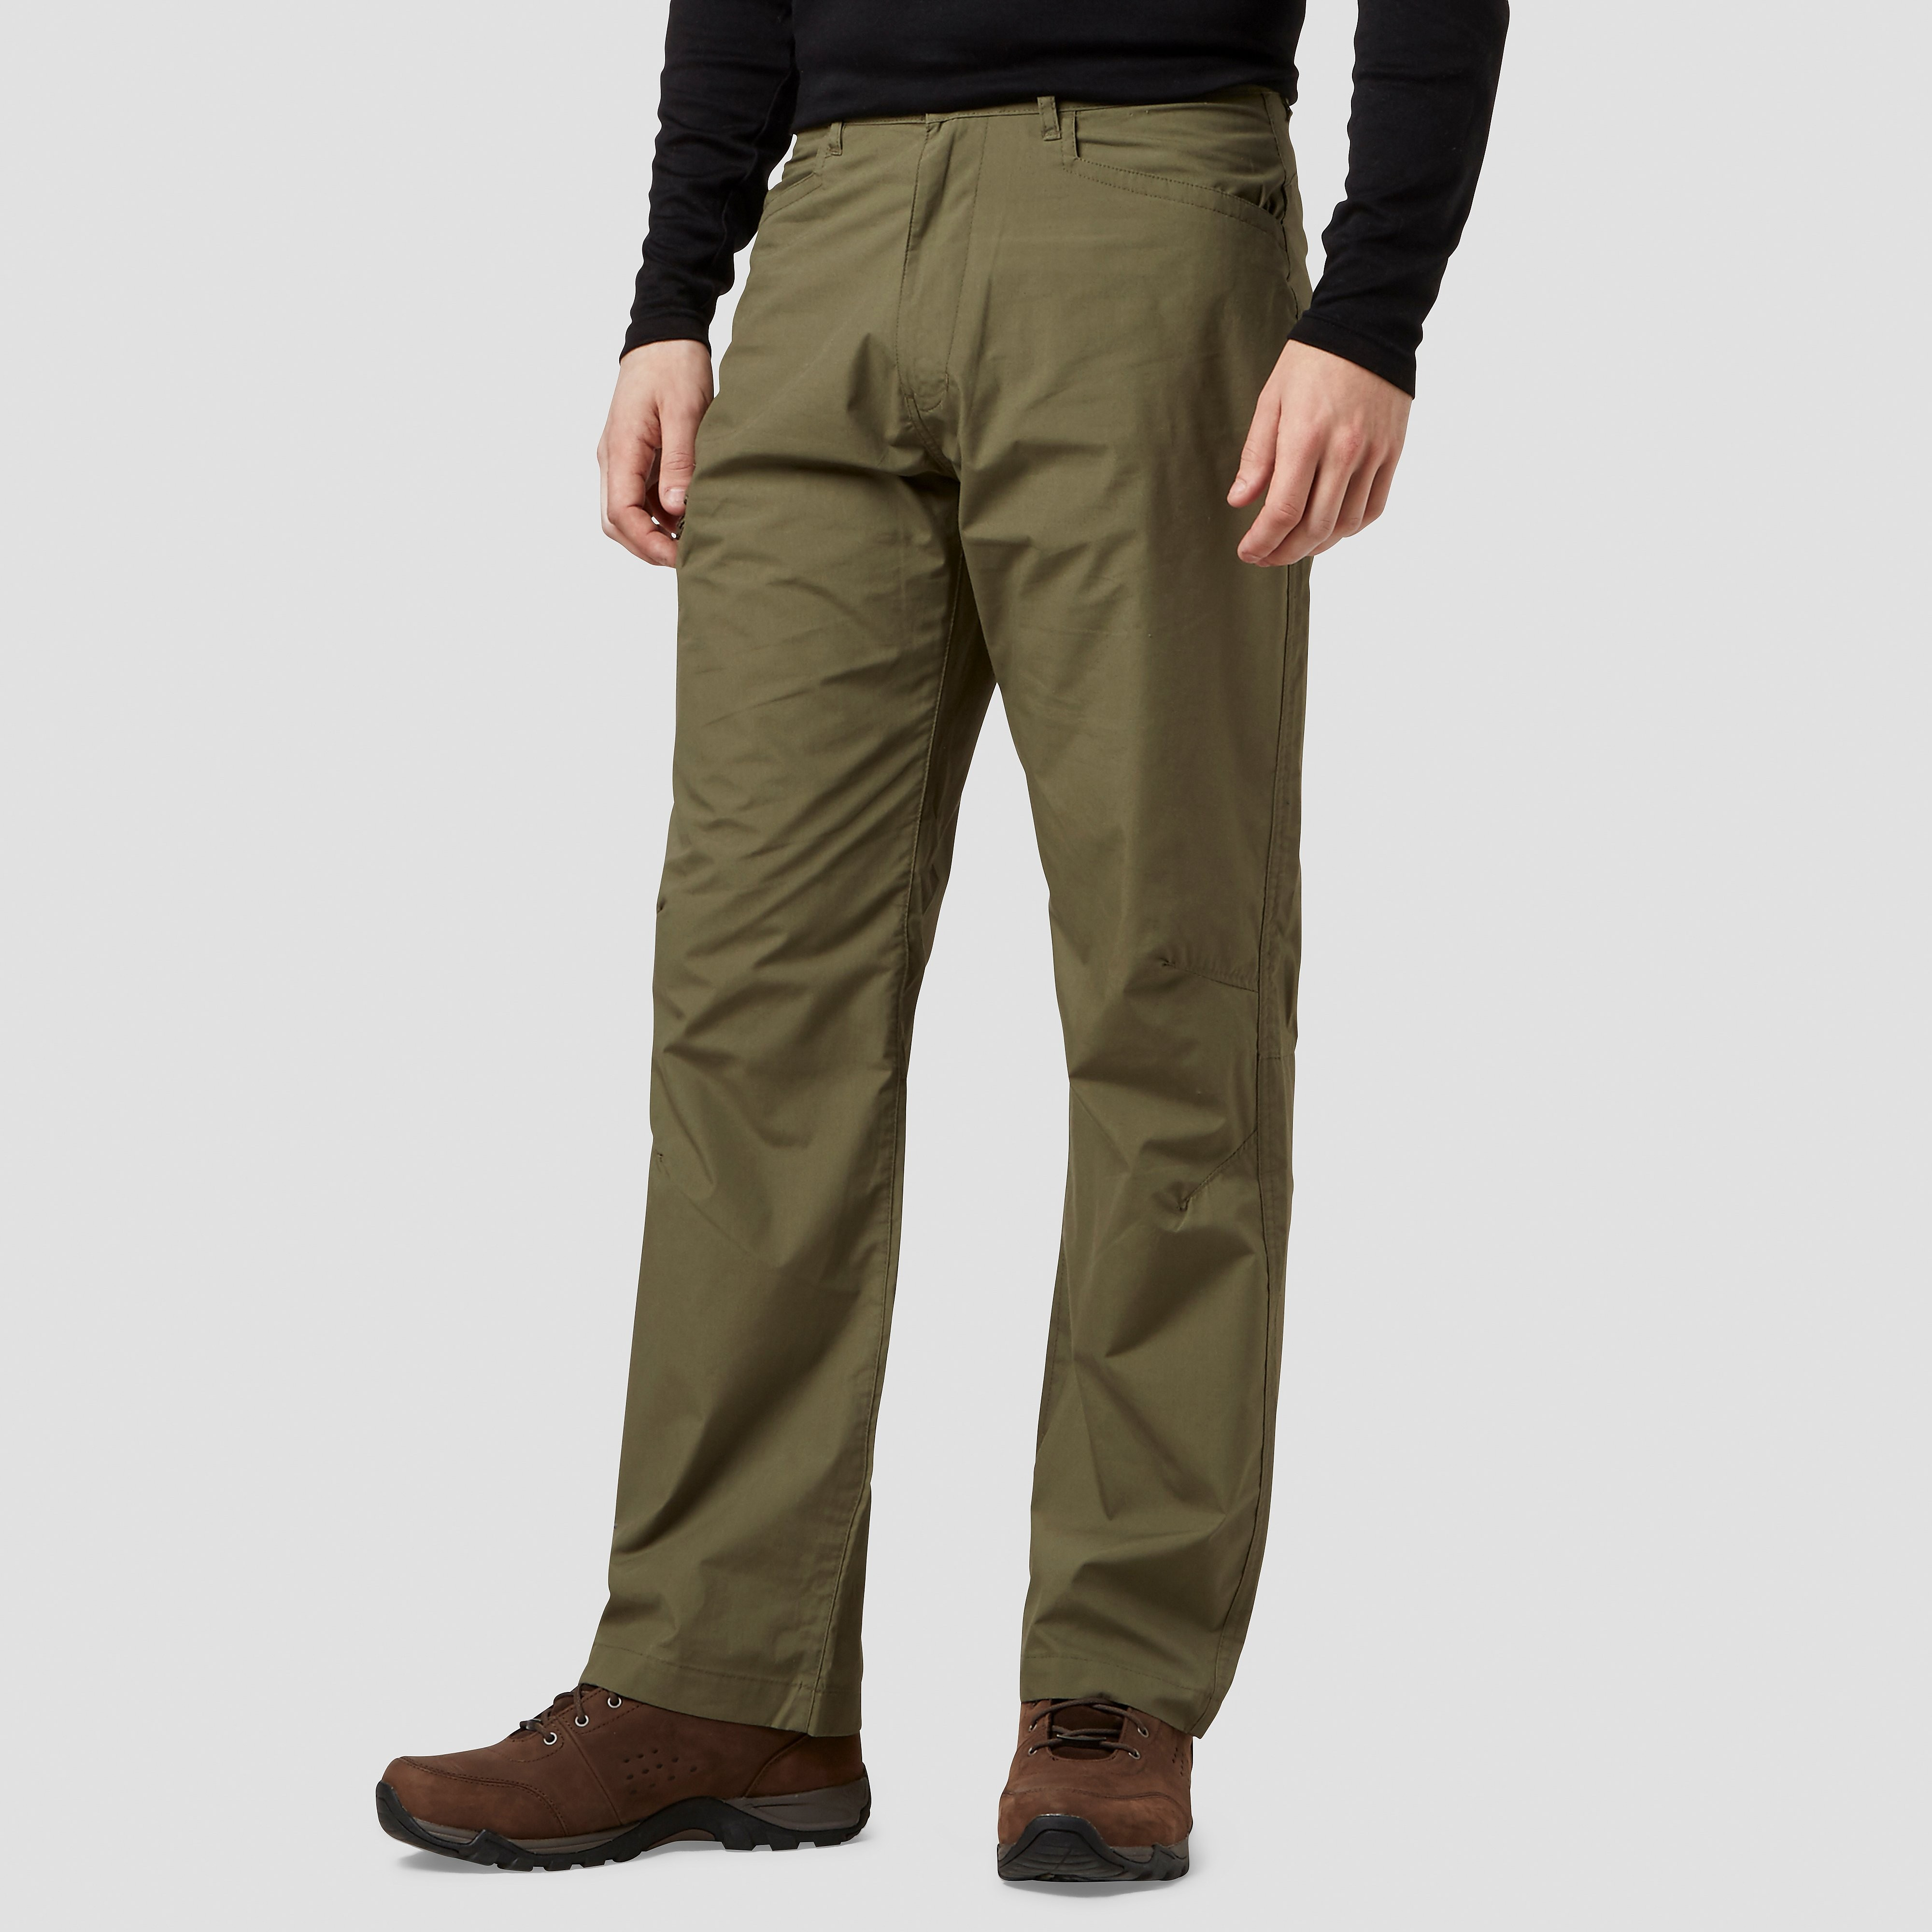 Peter Storm Men's Ramble Regular Walking Trousers